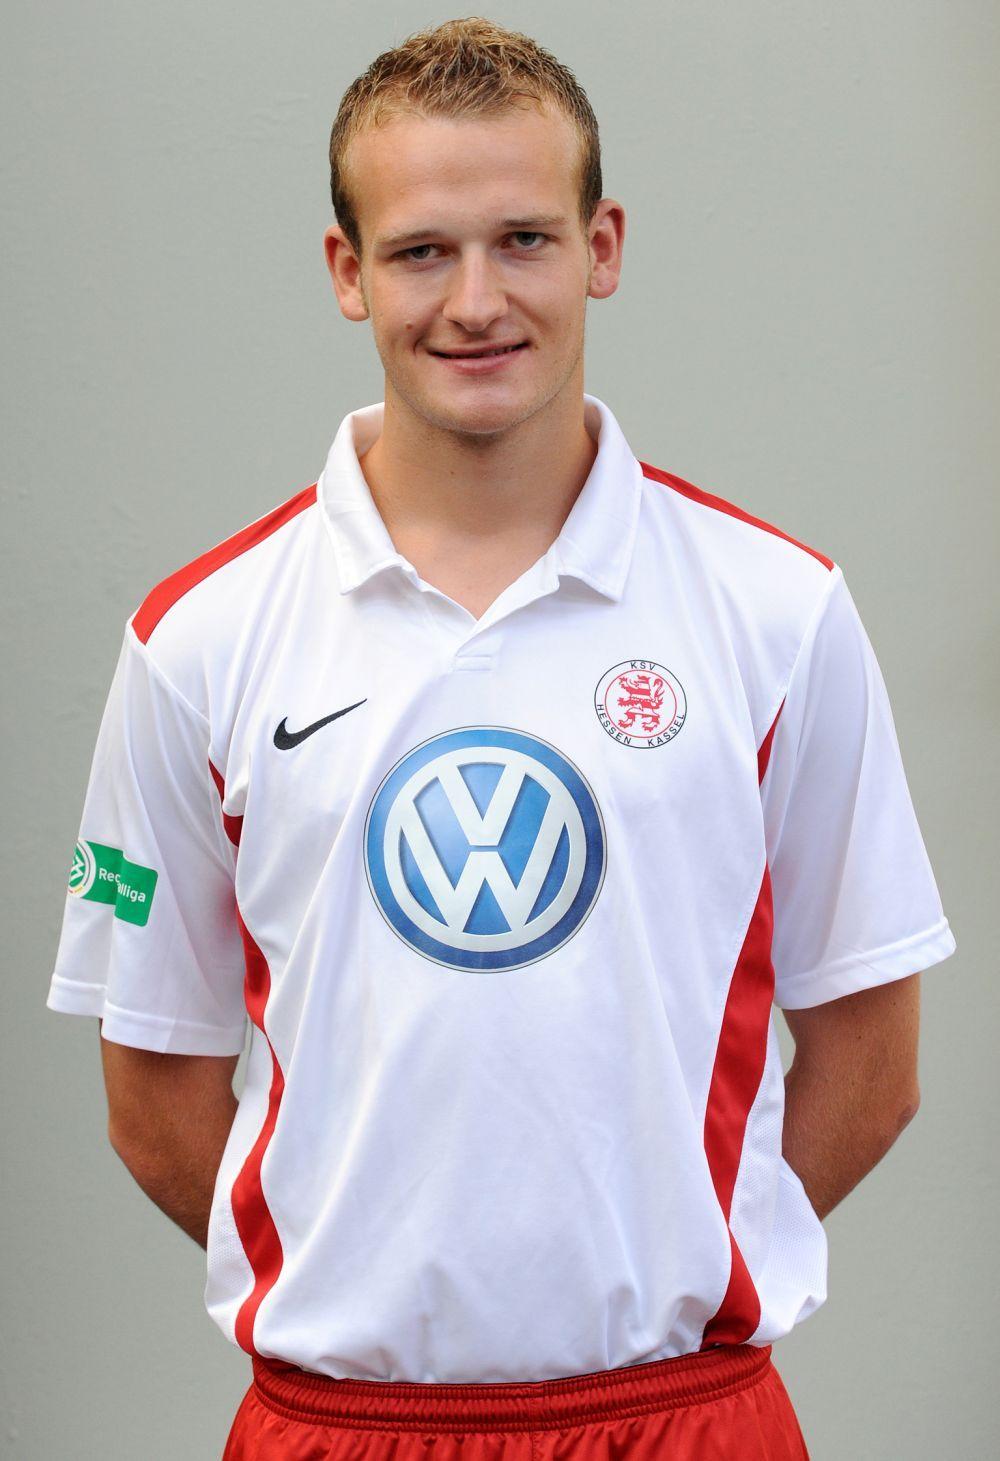 Dennis Joedecke